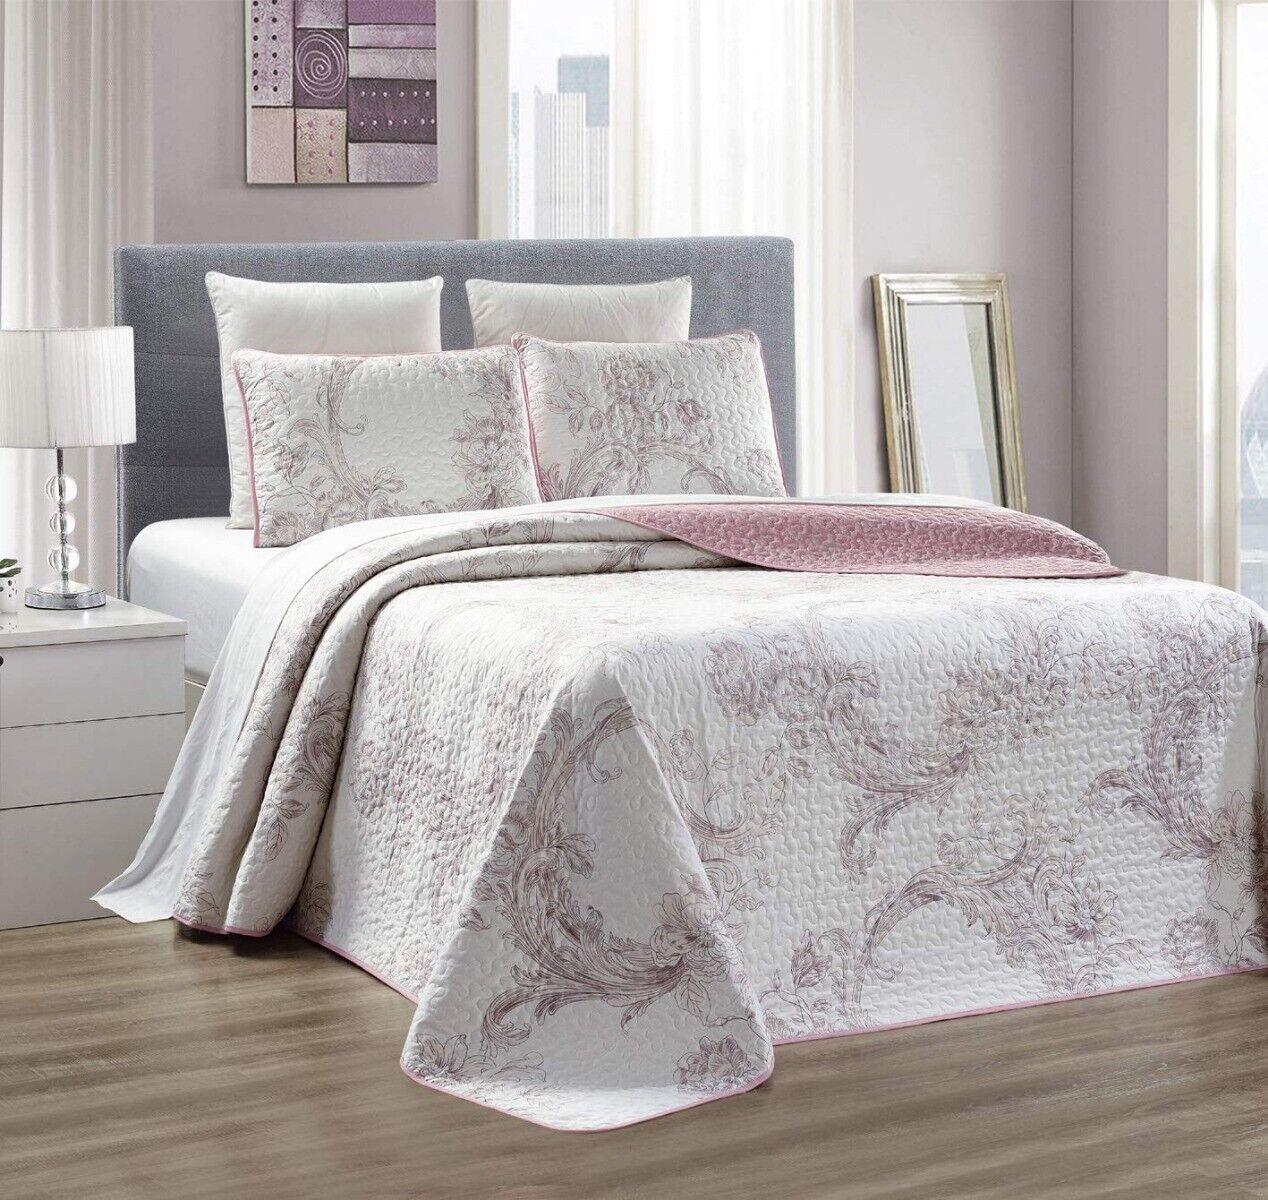 Light Purple White Floral Quilt Reversible Full/Queen Size C